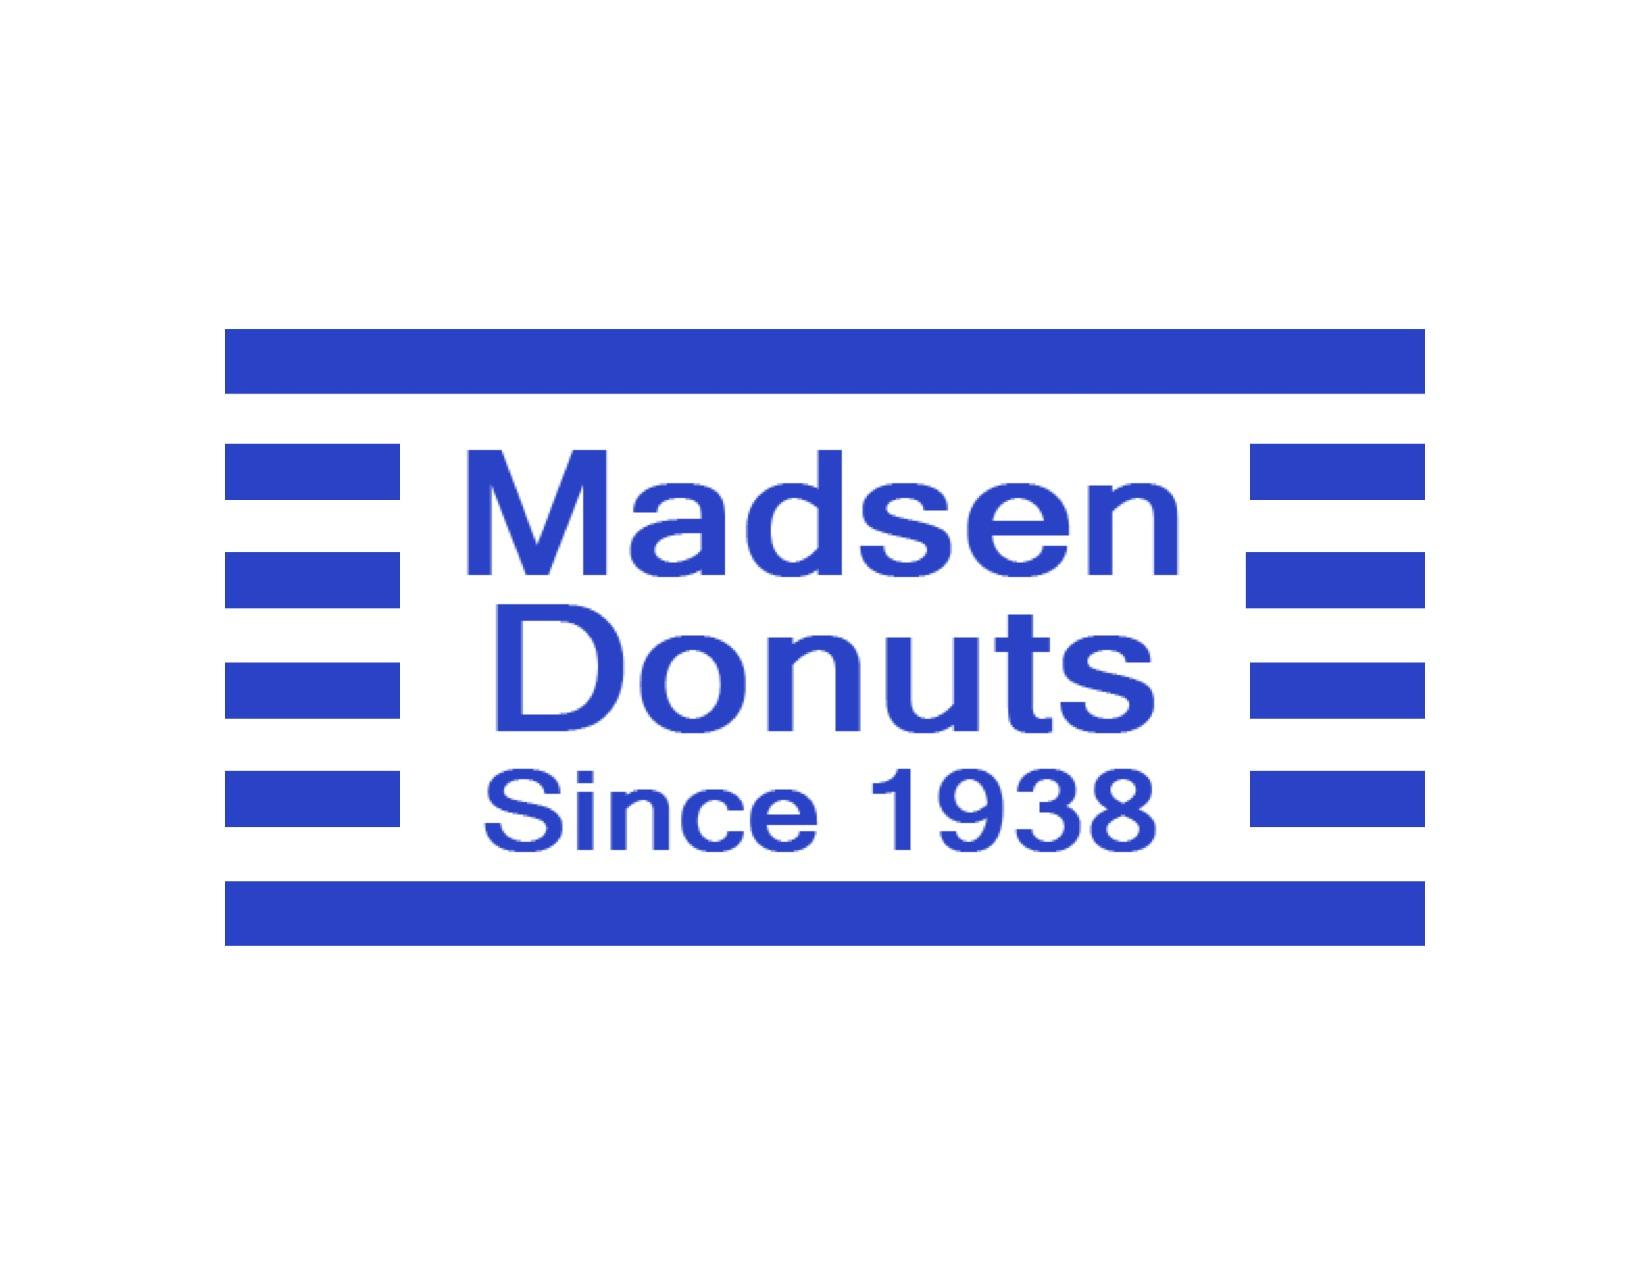 madsen donuts new logo.jpg